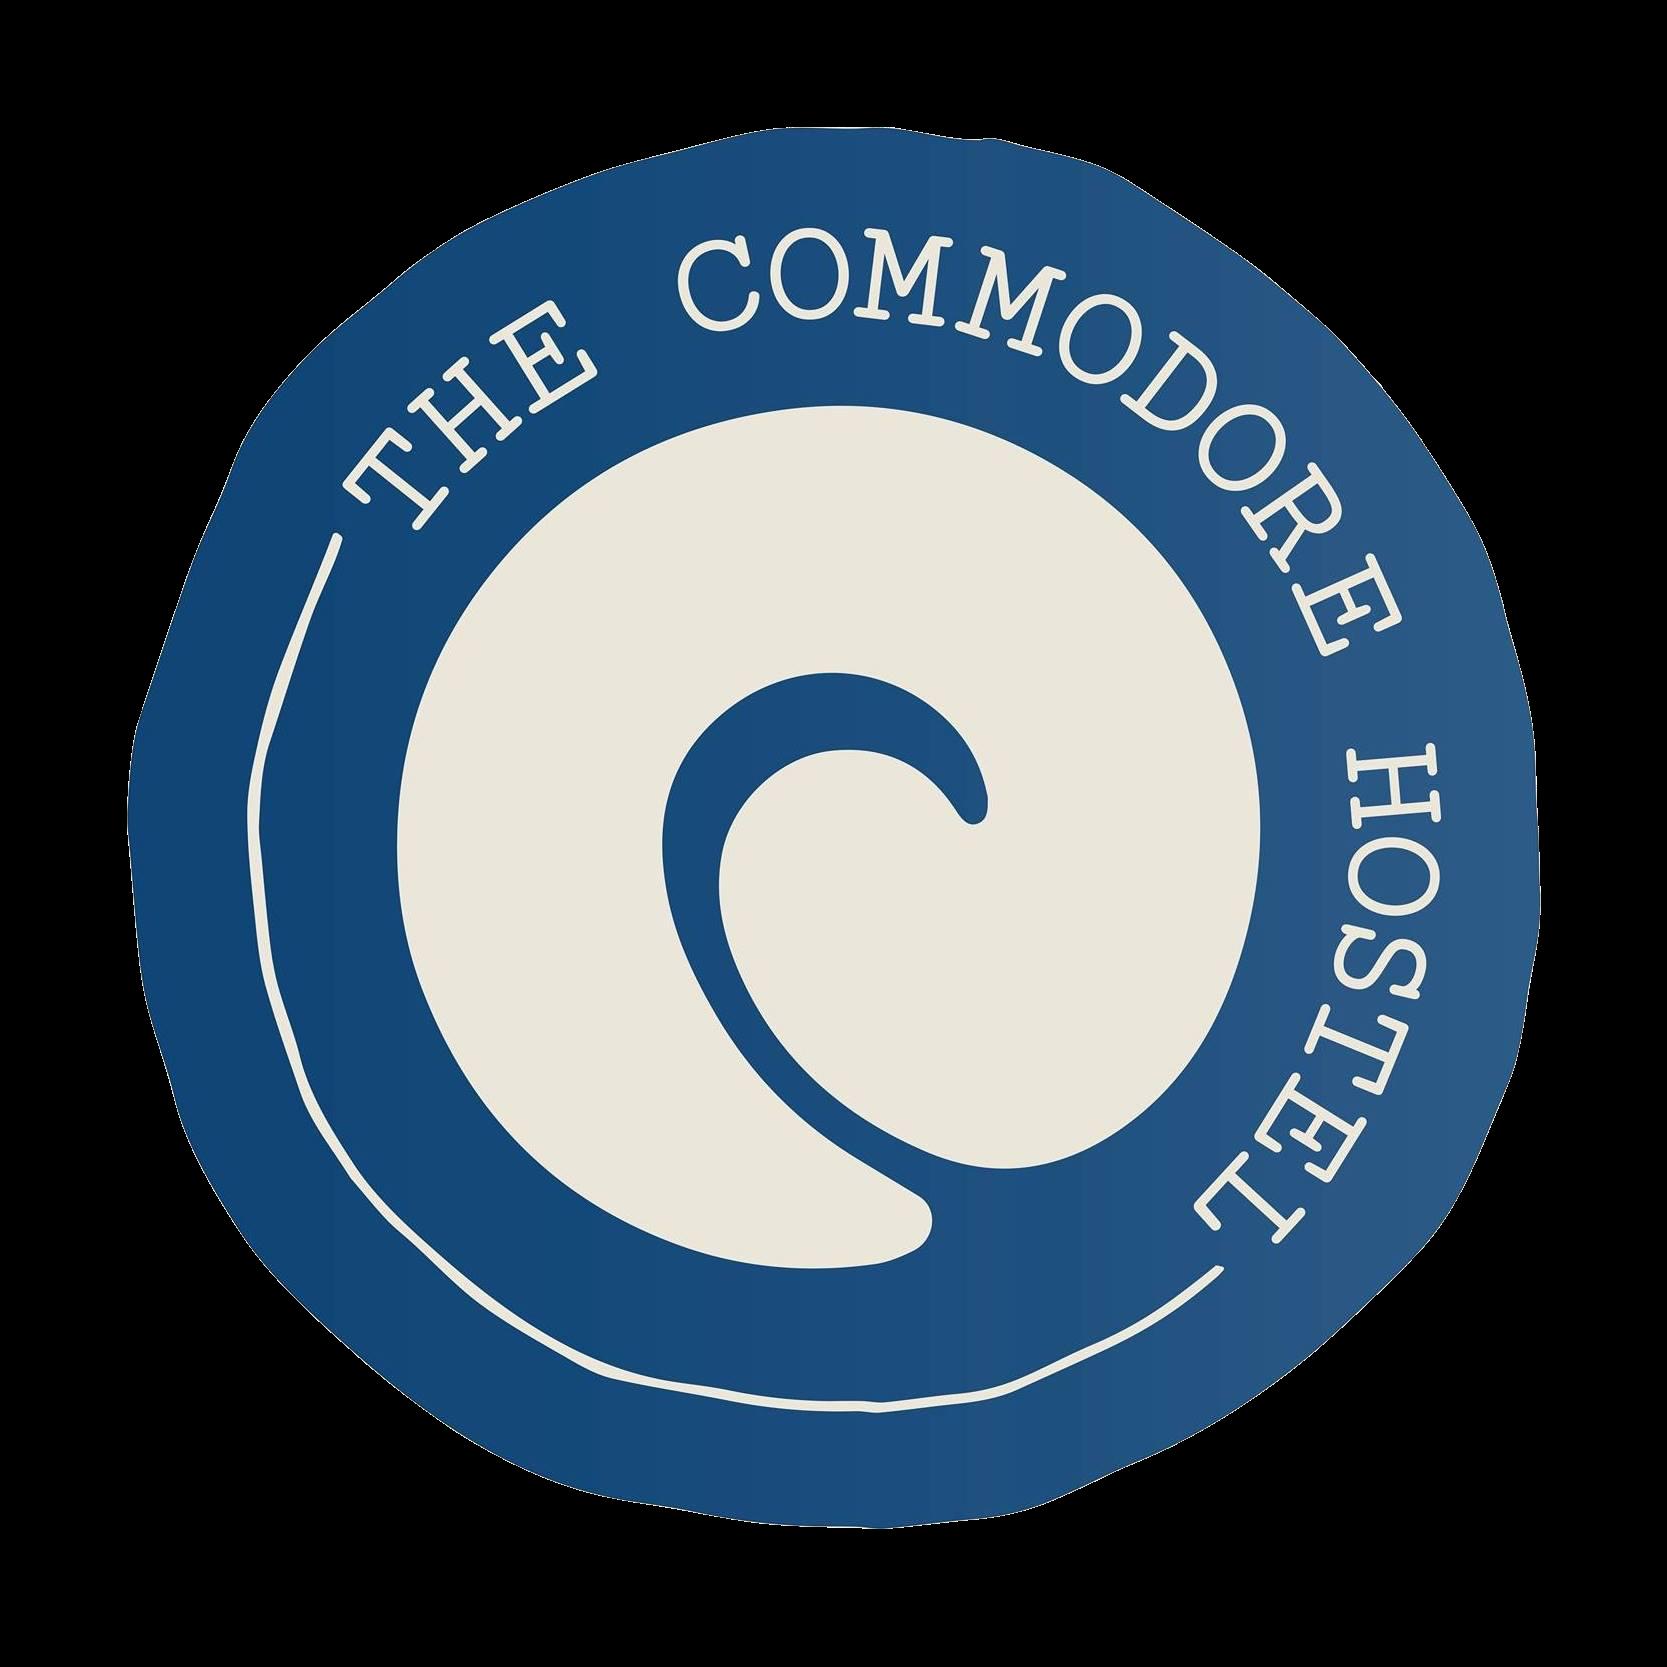 The Commodore Hostel